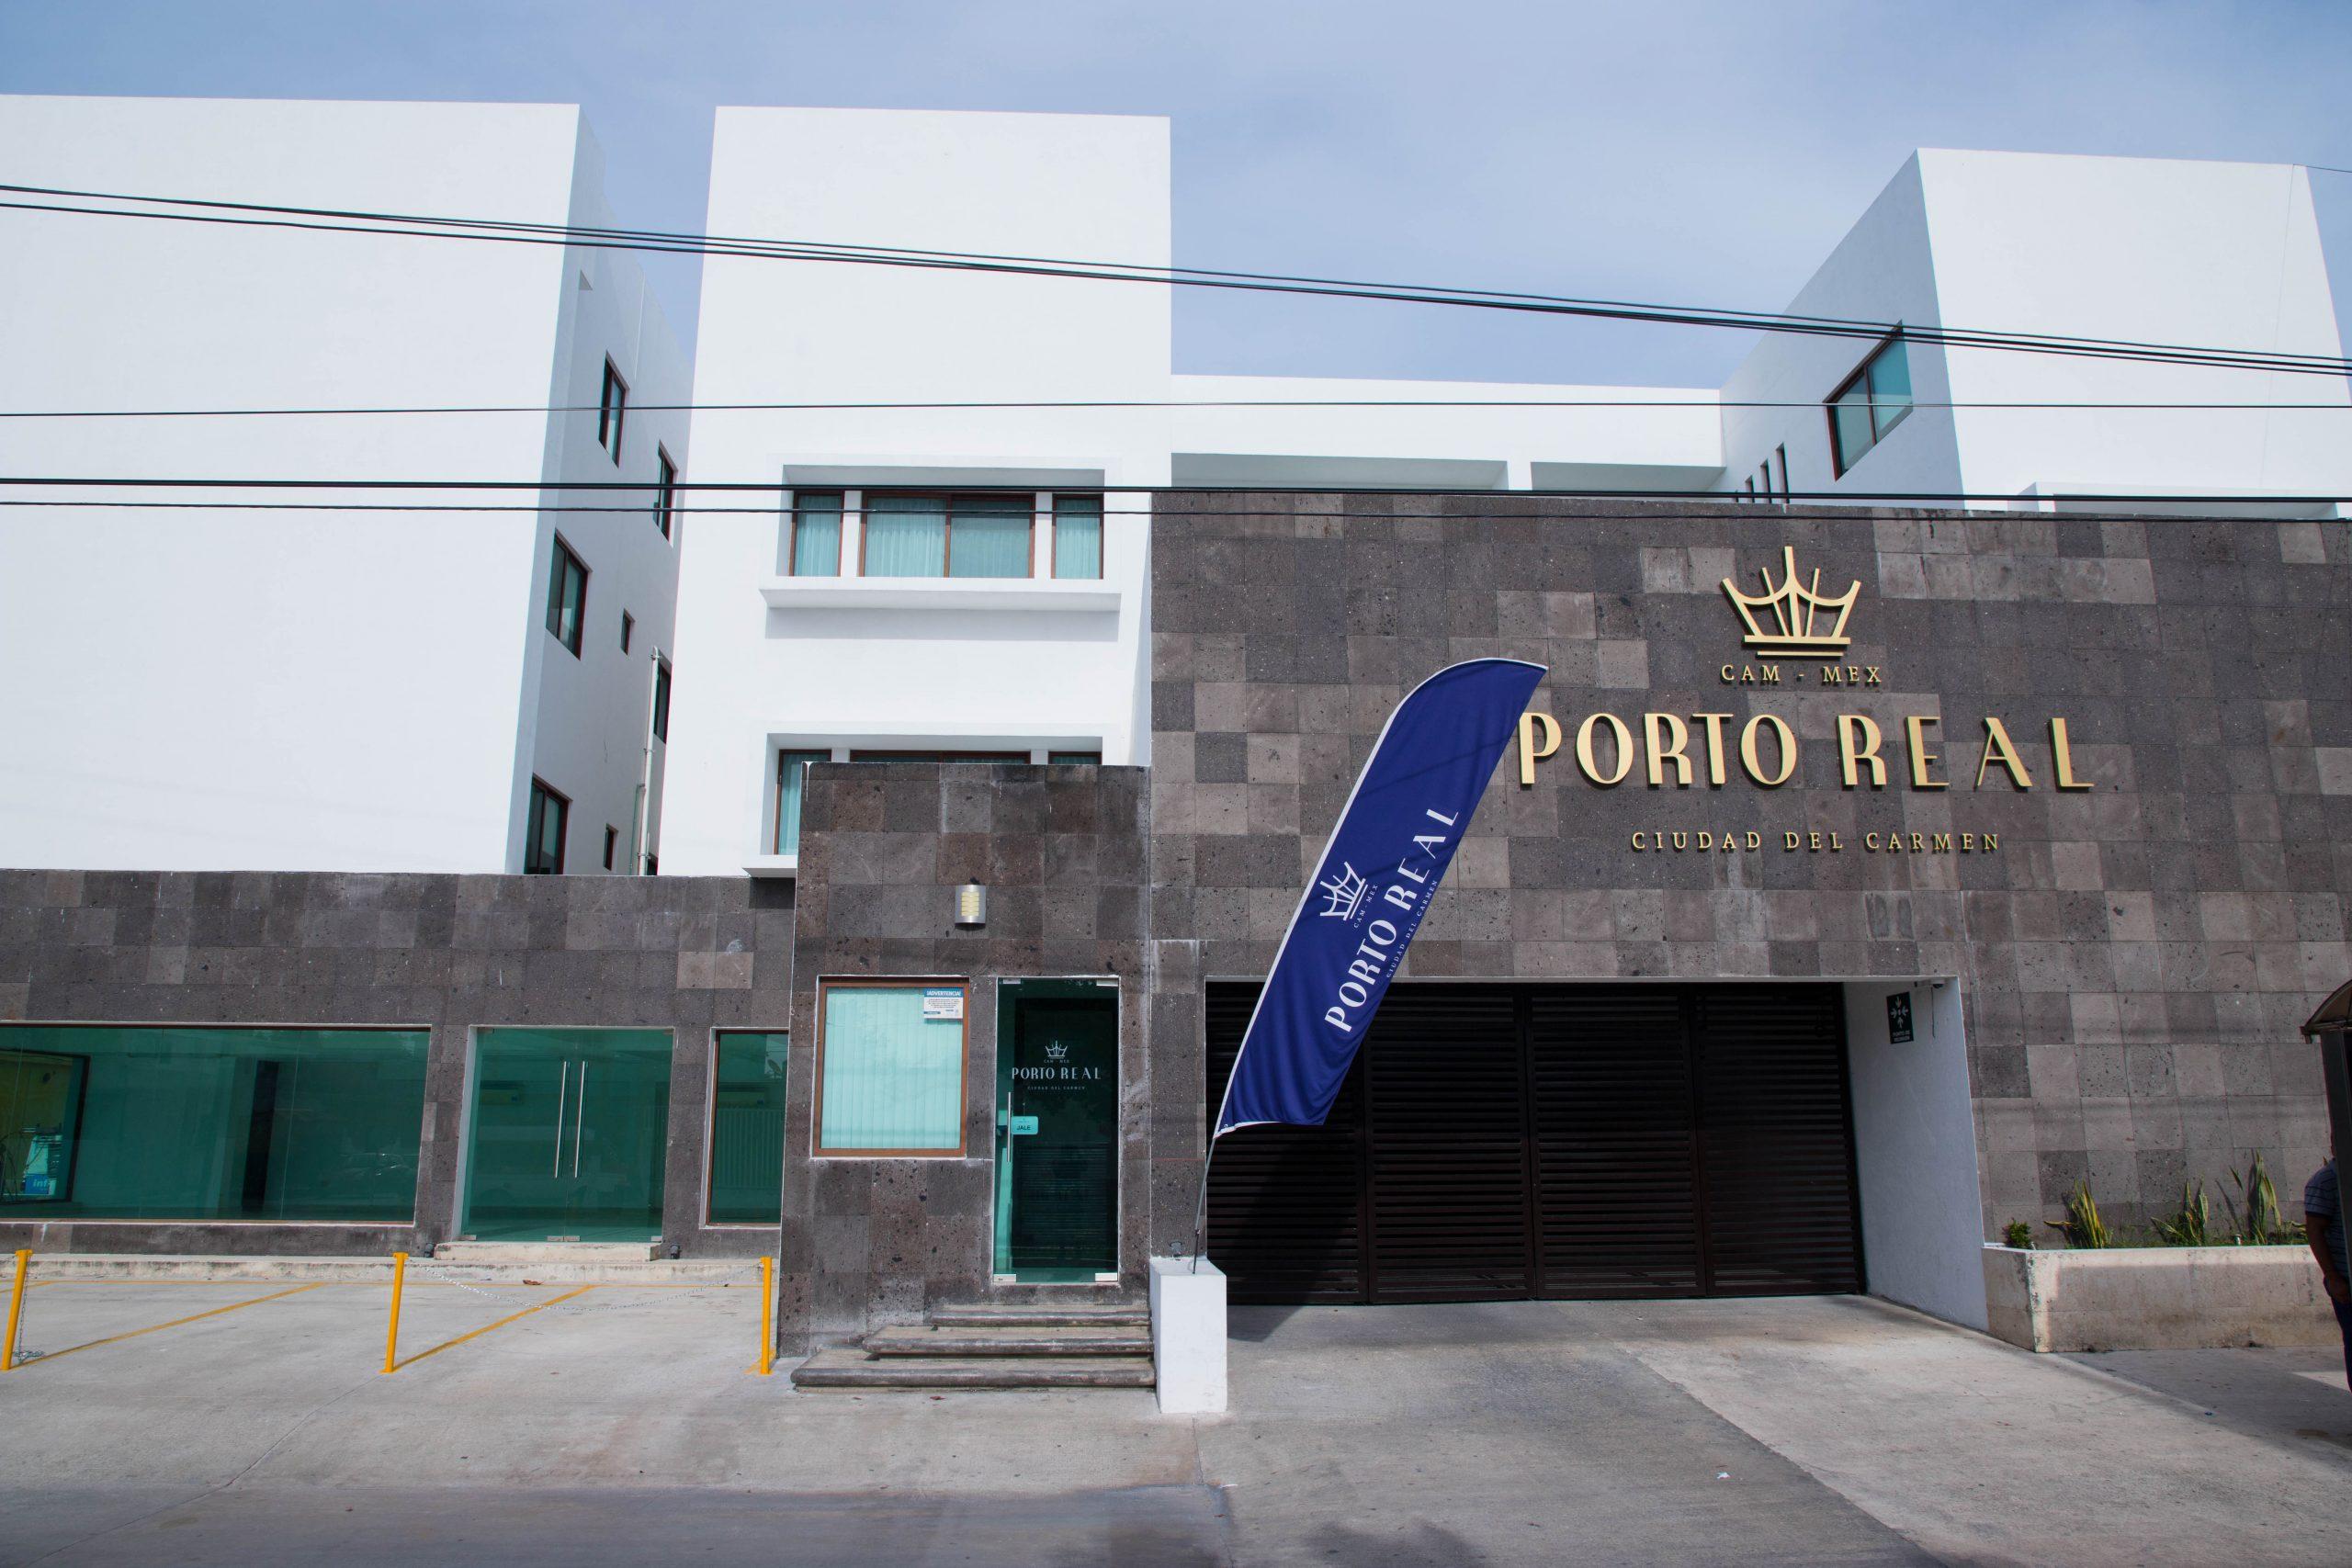 Porto Real